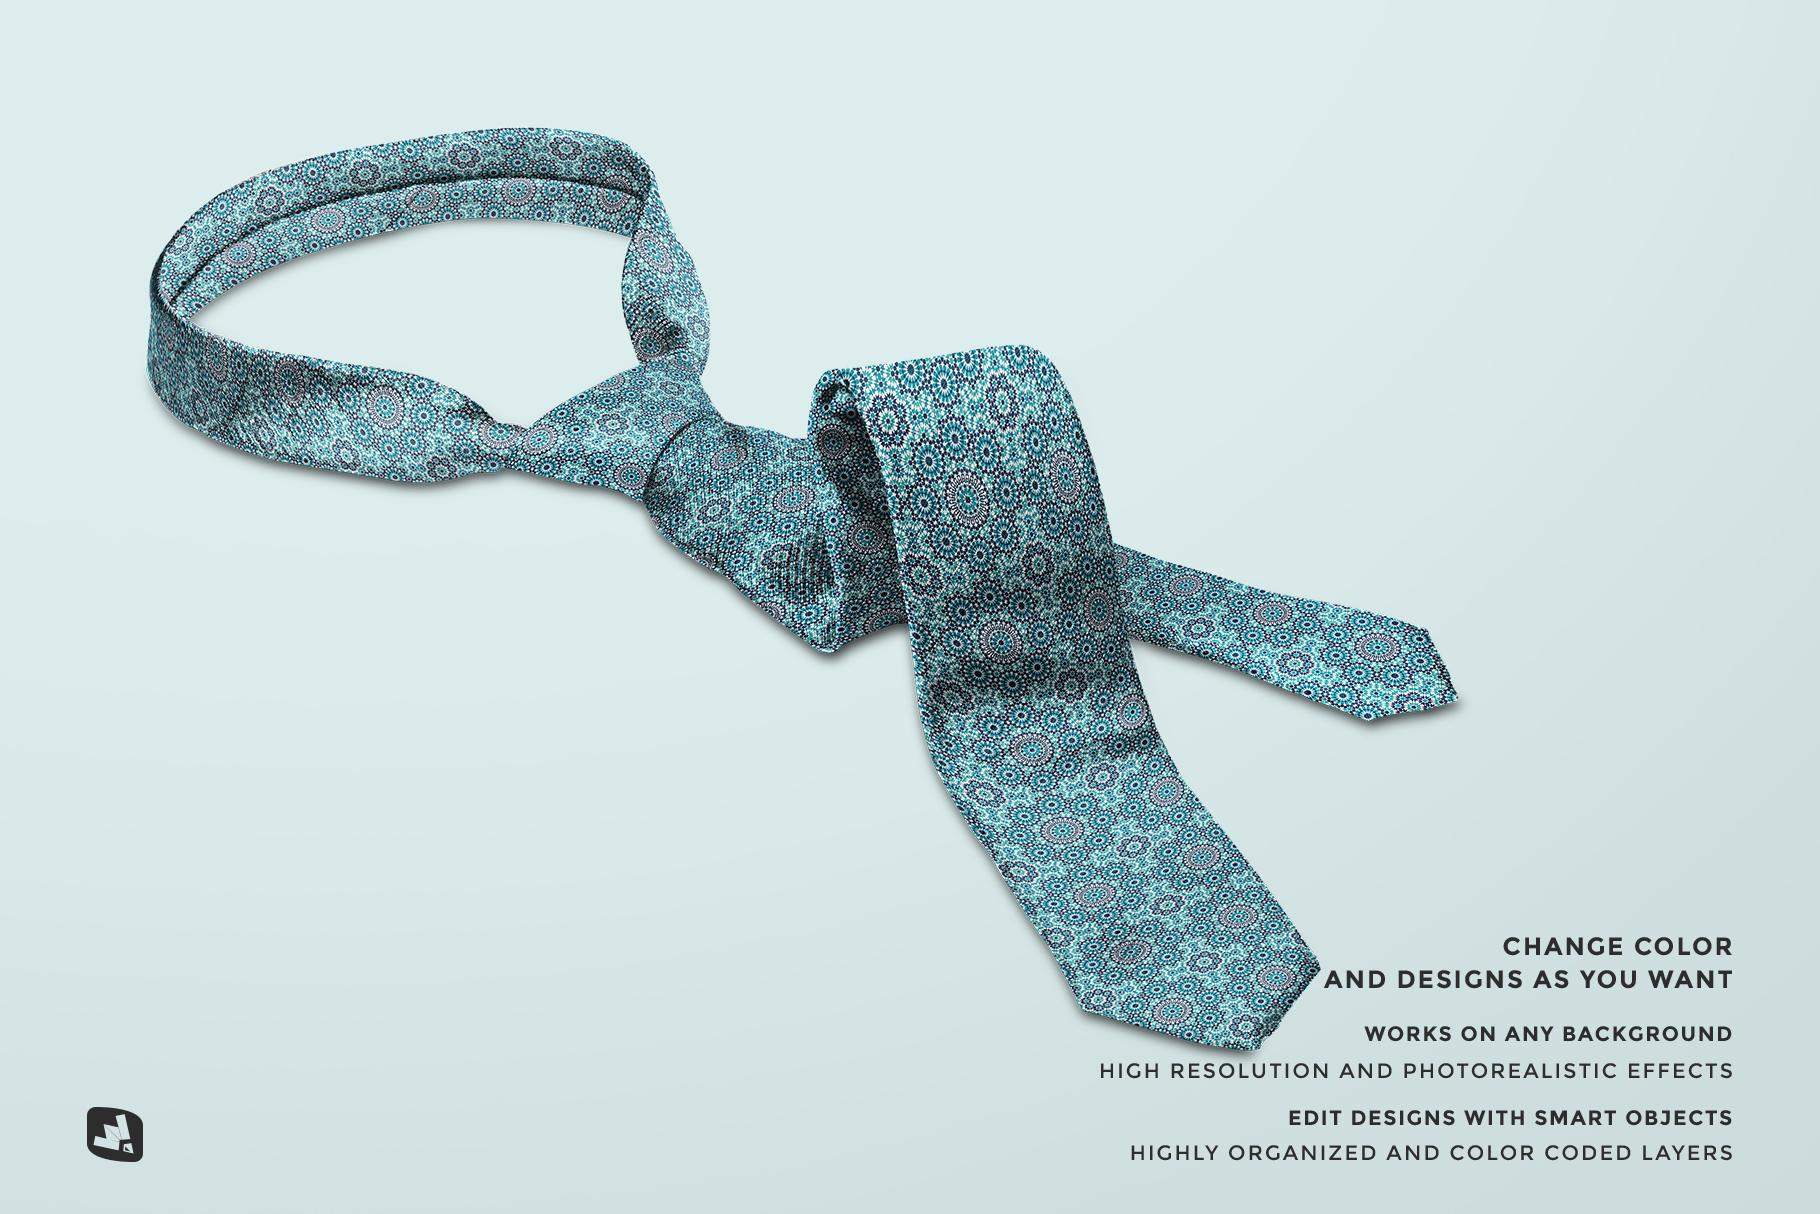 features of the men's formal tie mockup